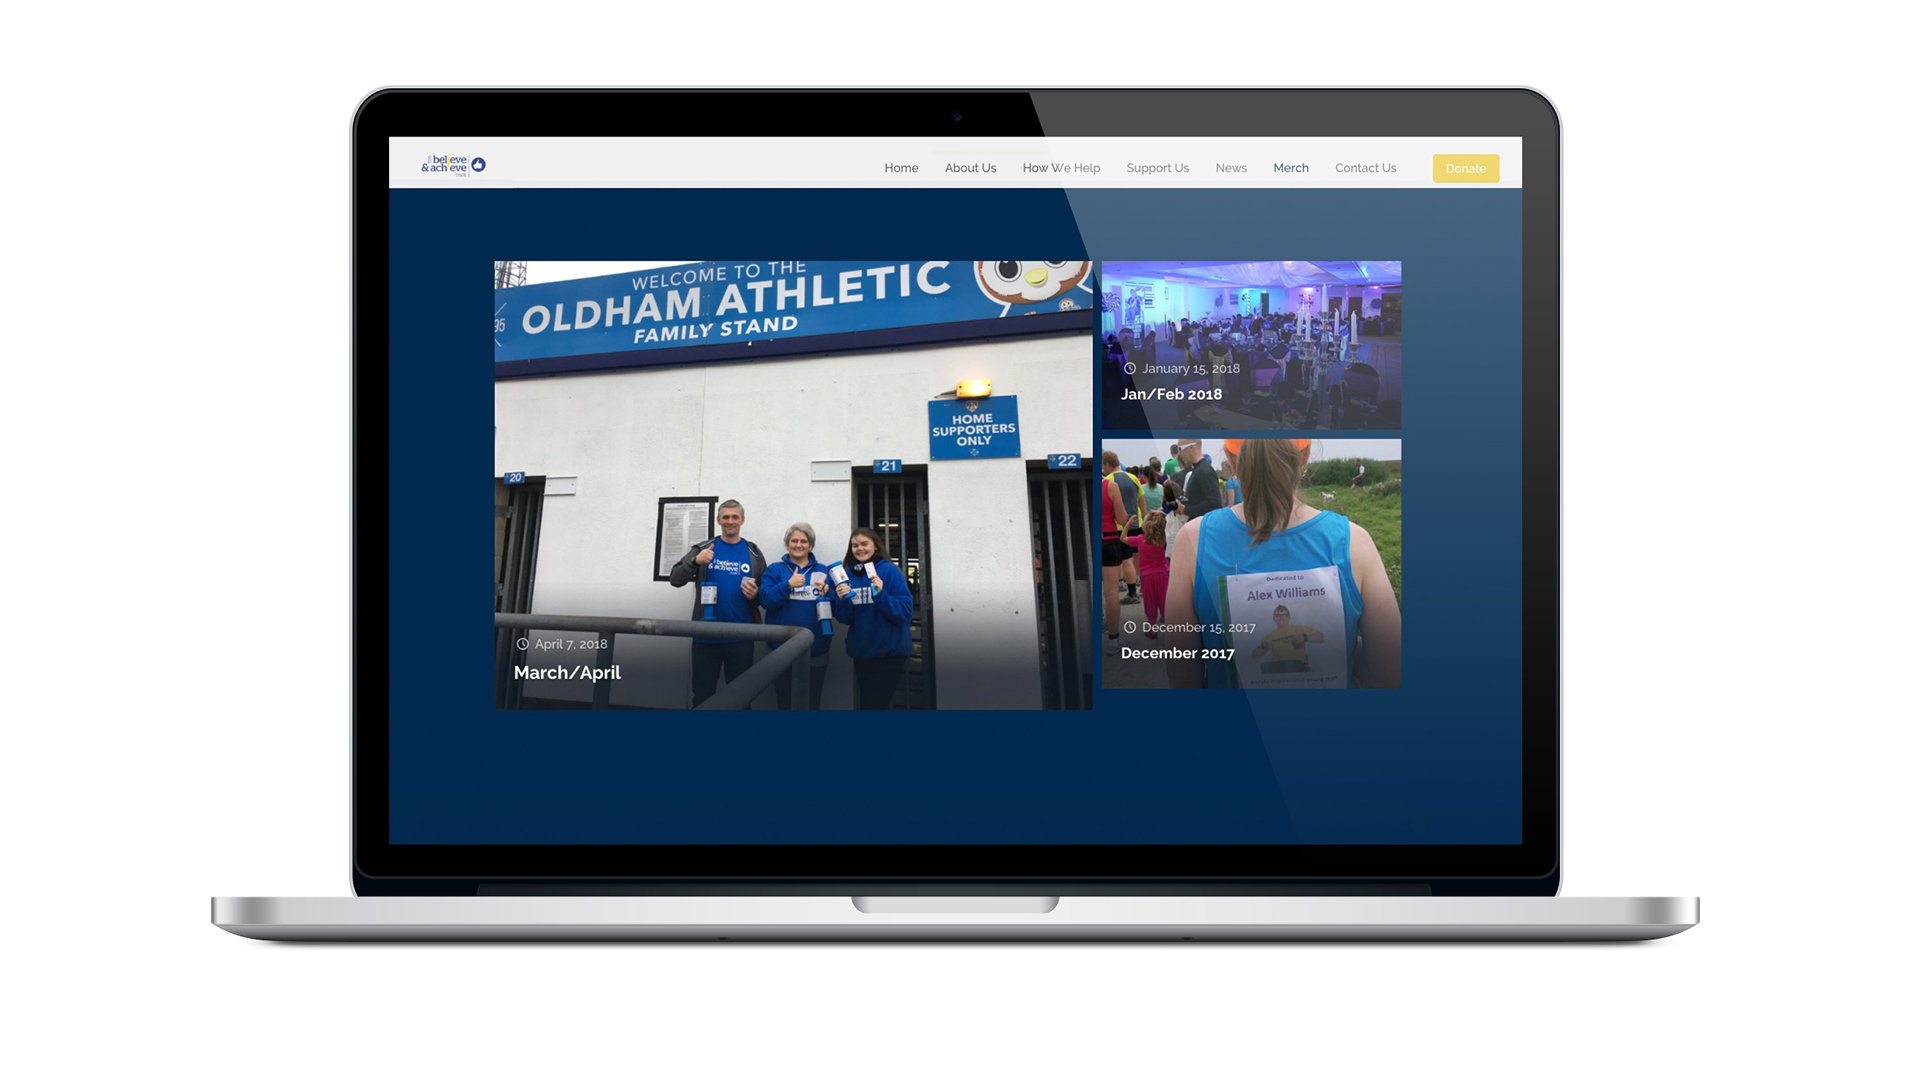 Believe & Achieve website design shown on laptop device